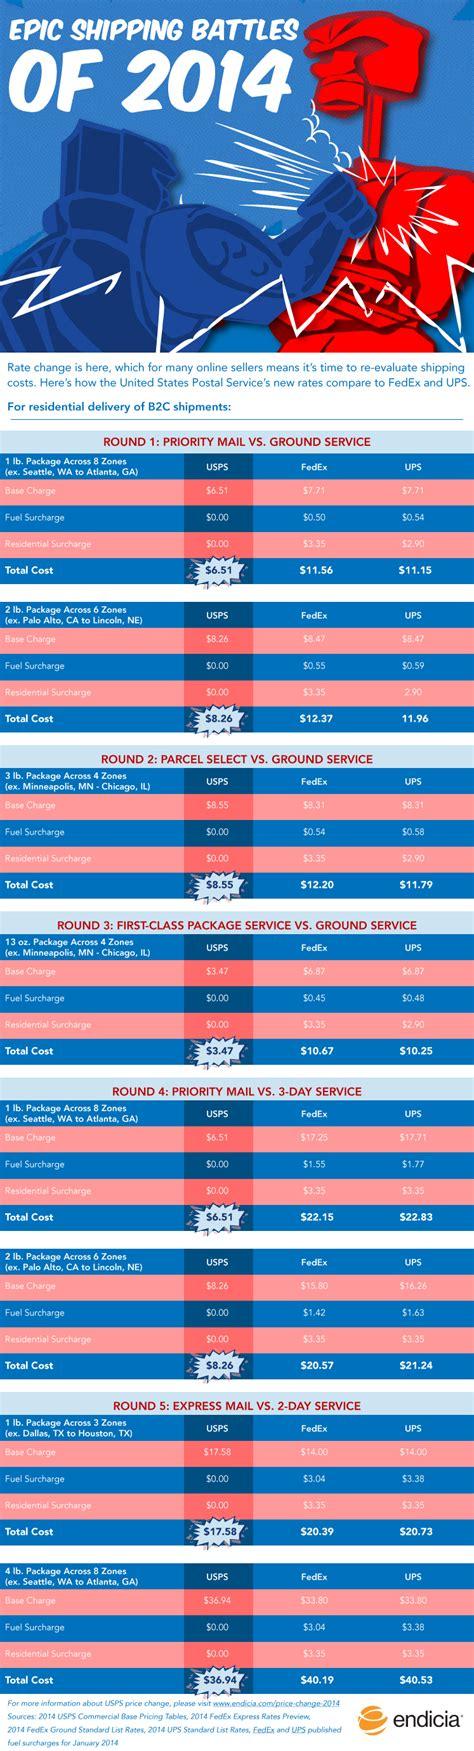 shipping battles  price change comparison charts